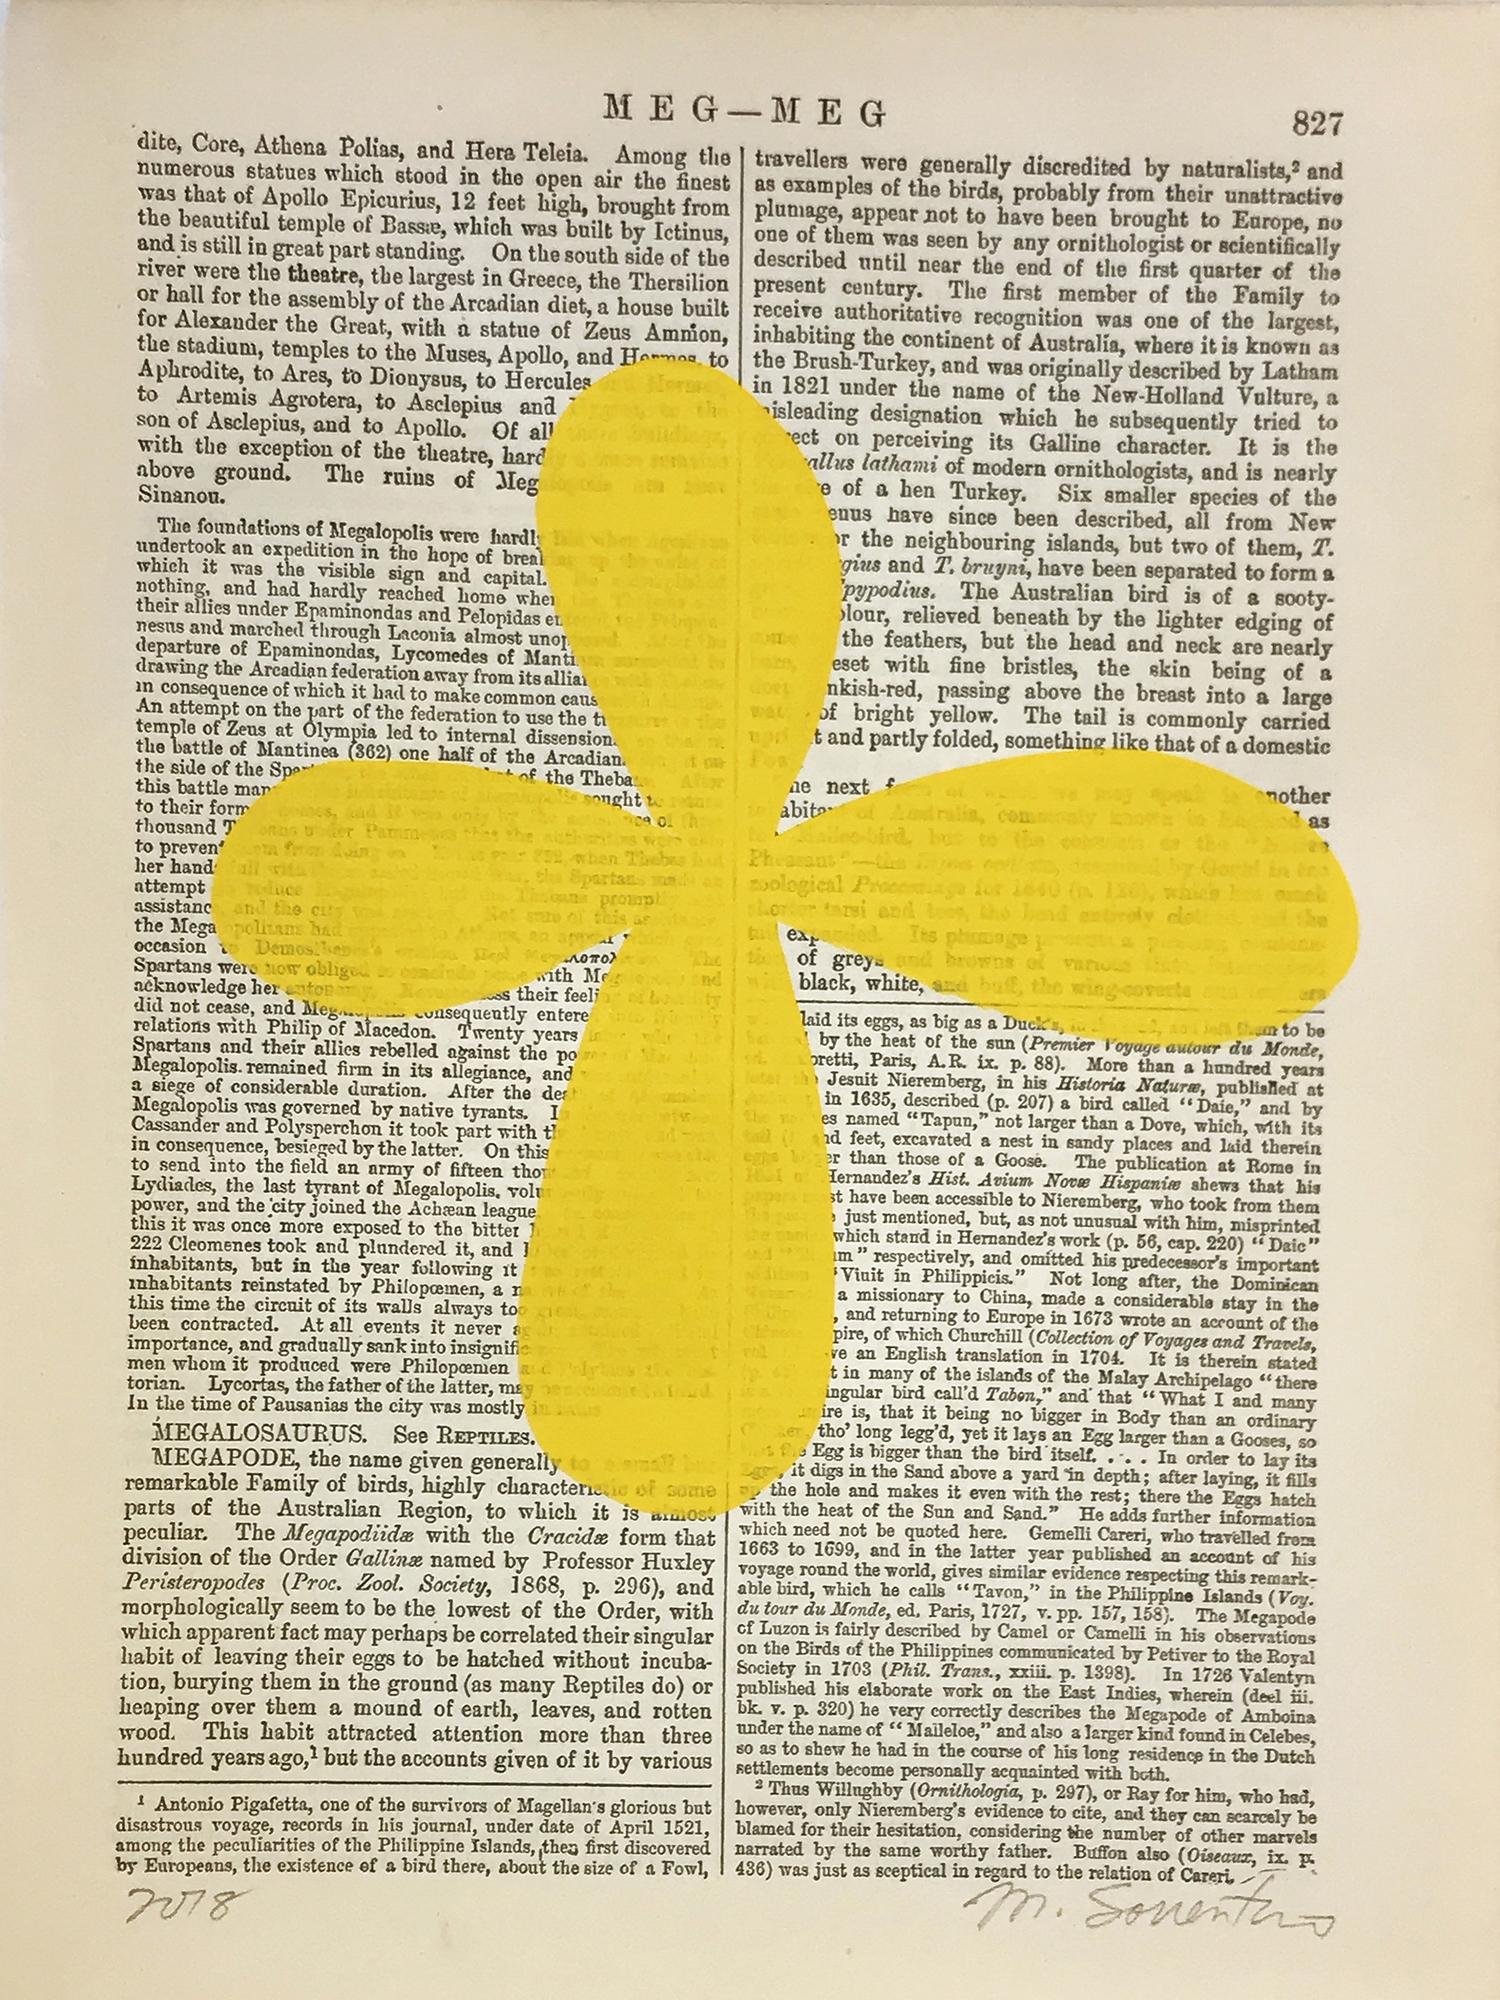 Meg-Meg Yellow 827 by Michela Sorrentino